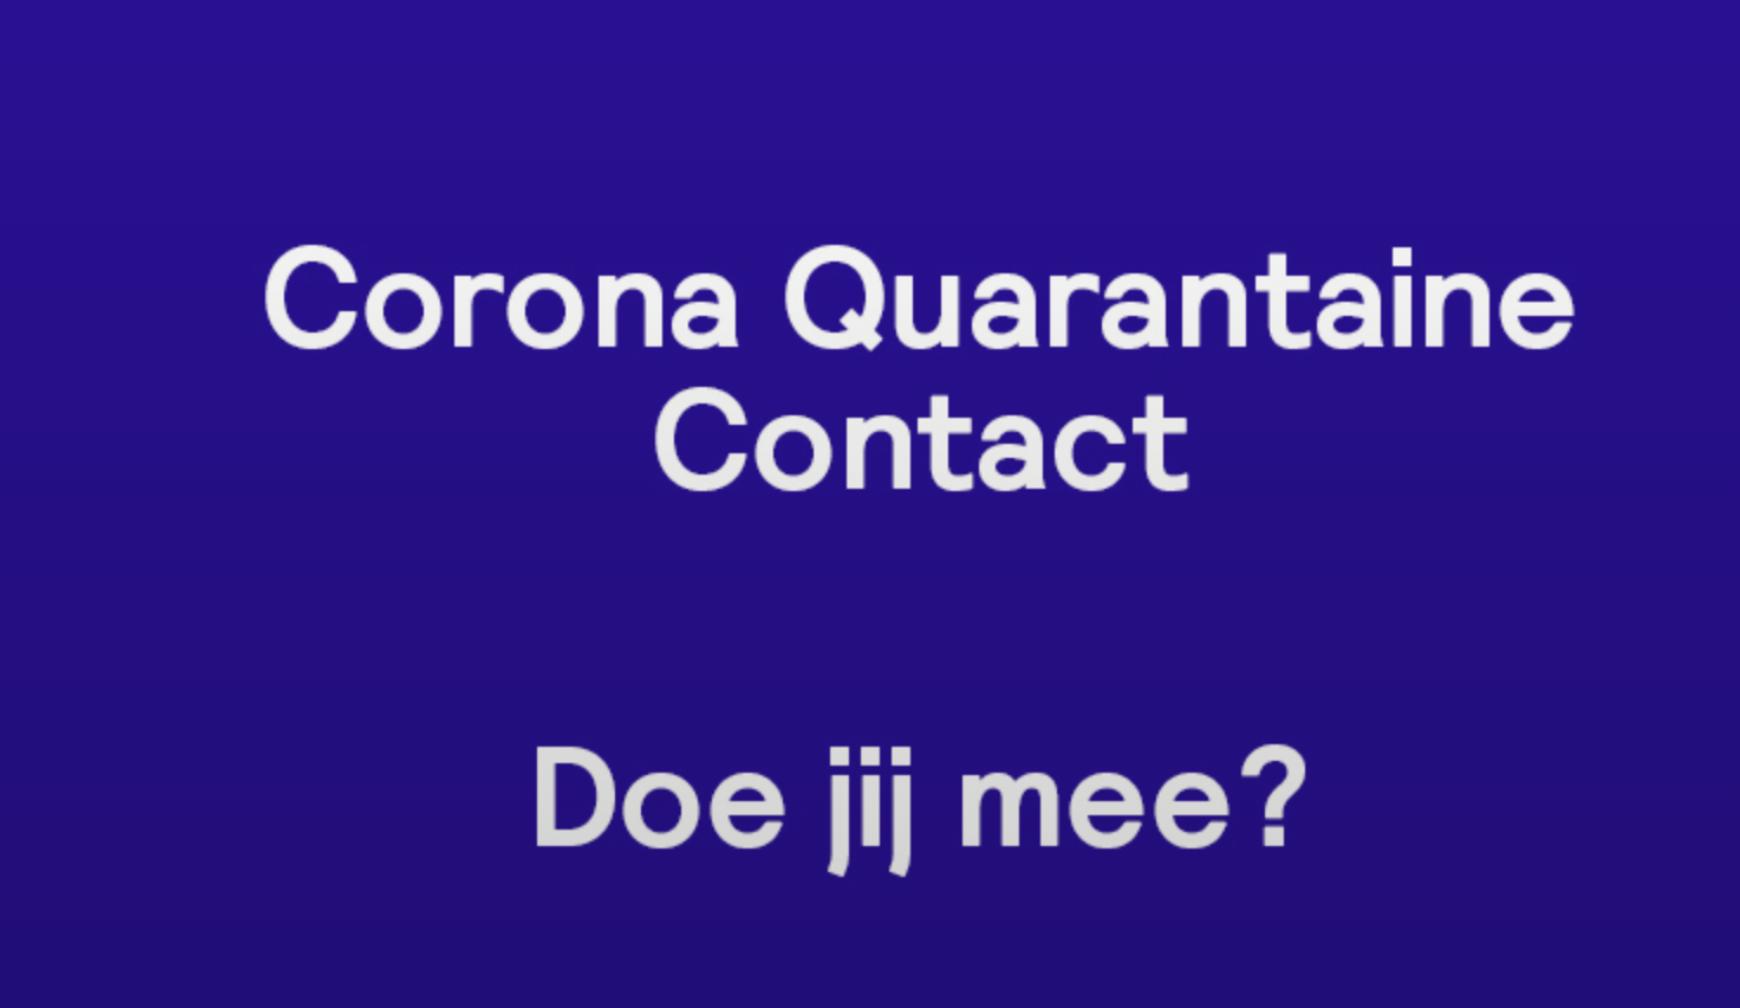 Corona Quarantaine Contact